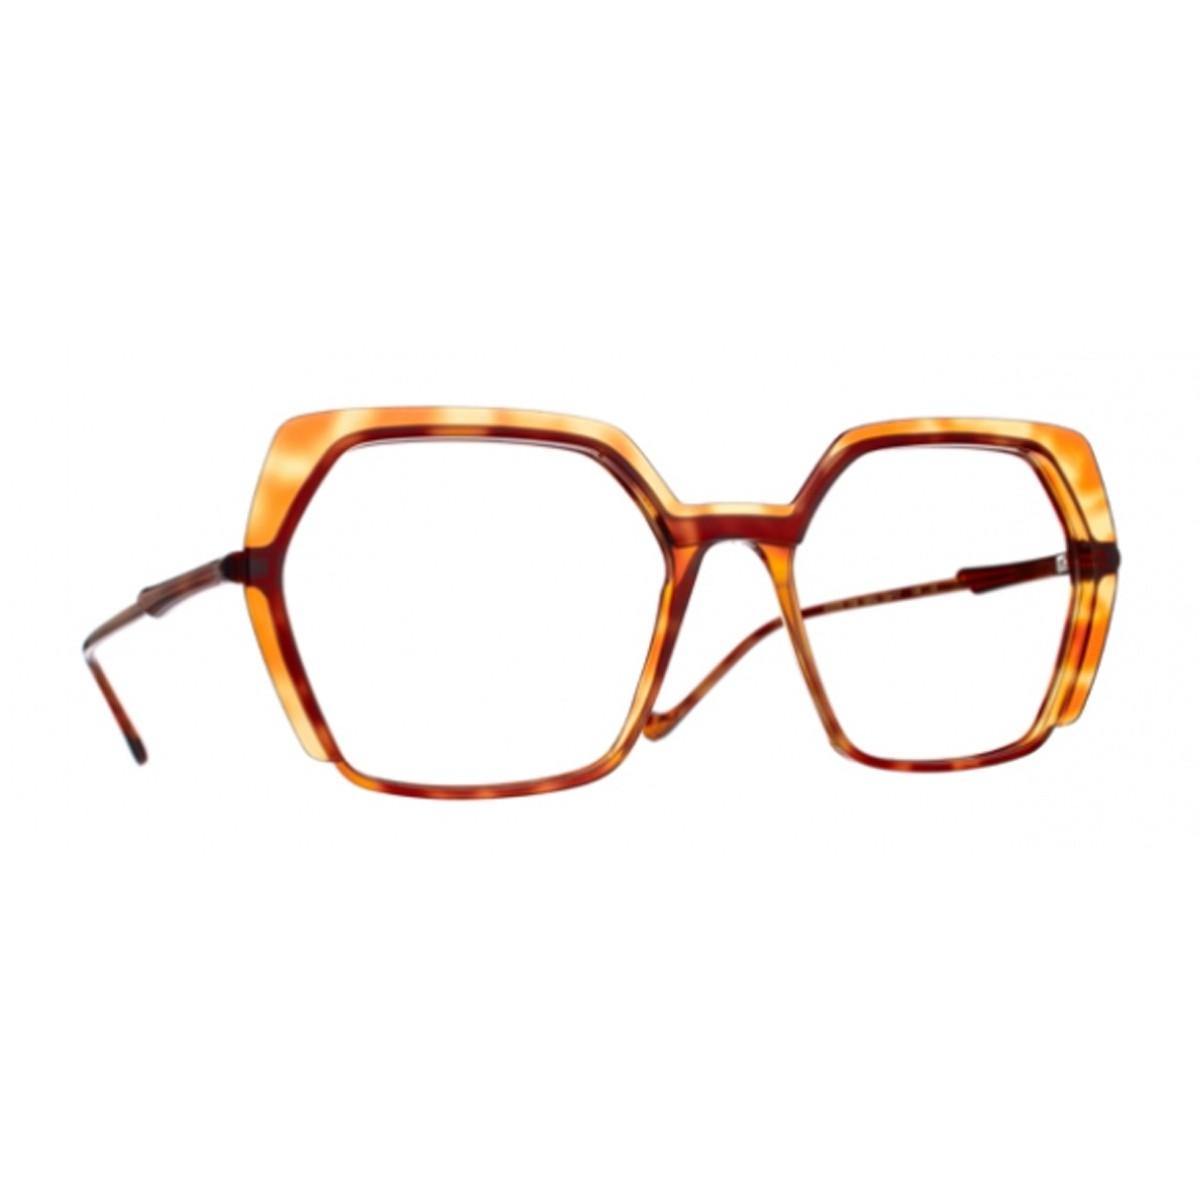 Caroline Abram Edith   Women's eyeglasses